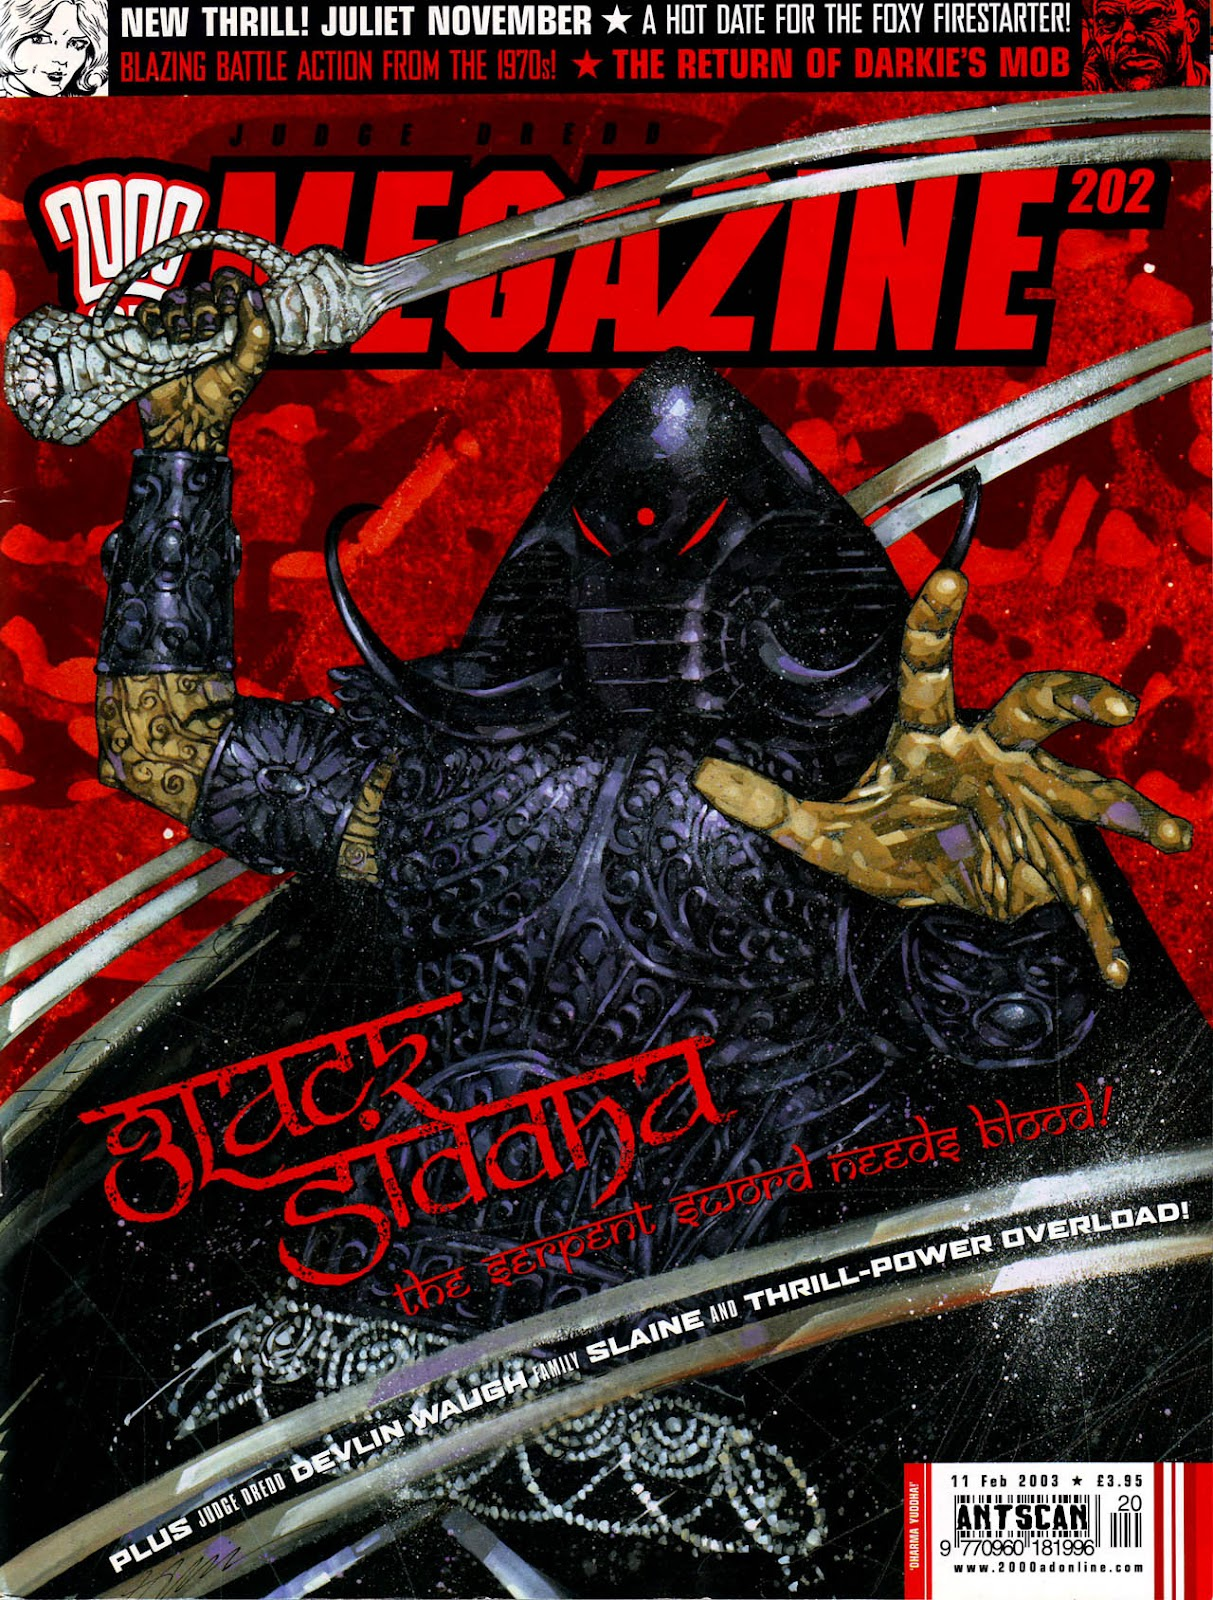 Judge Dredd Megazine (Vol. 5) issue 202 - Page 1